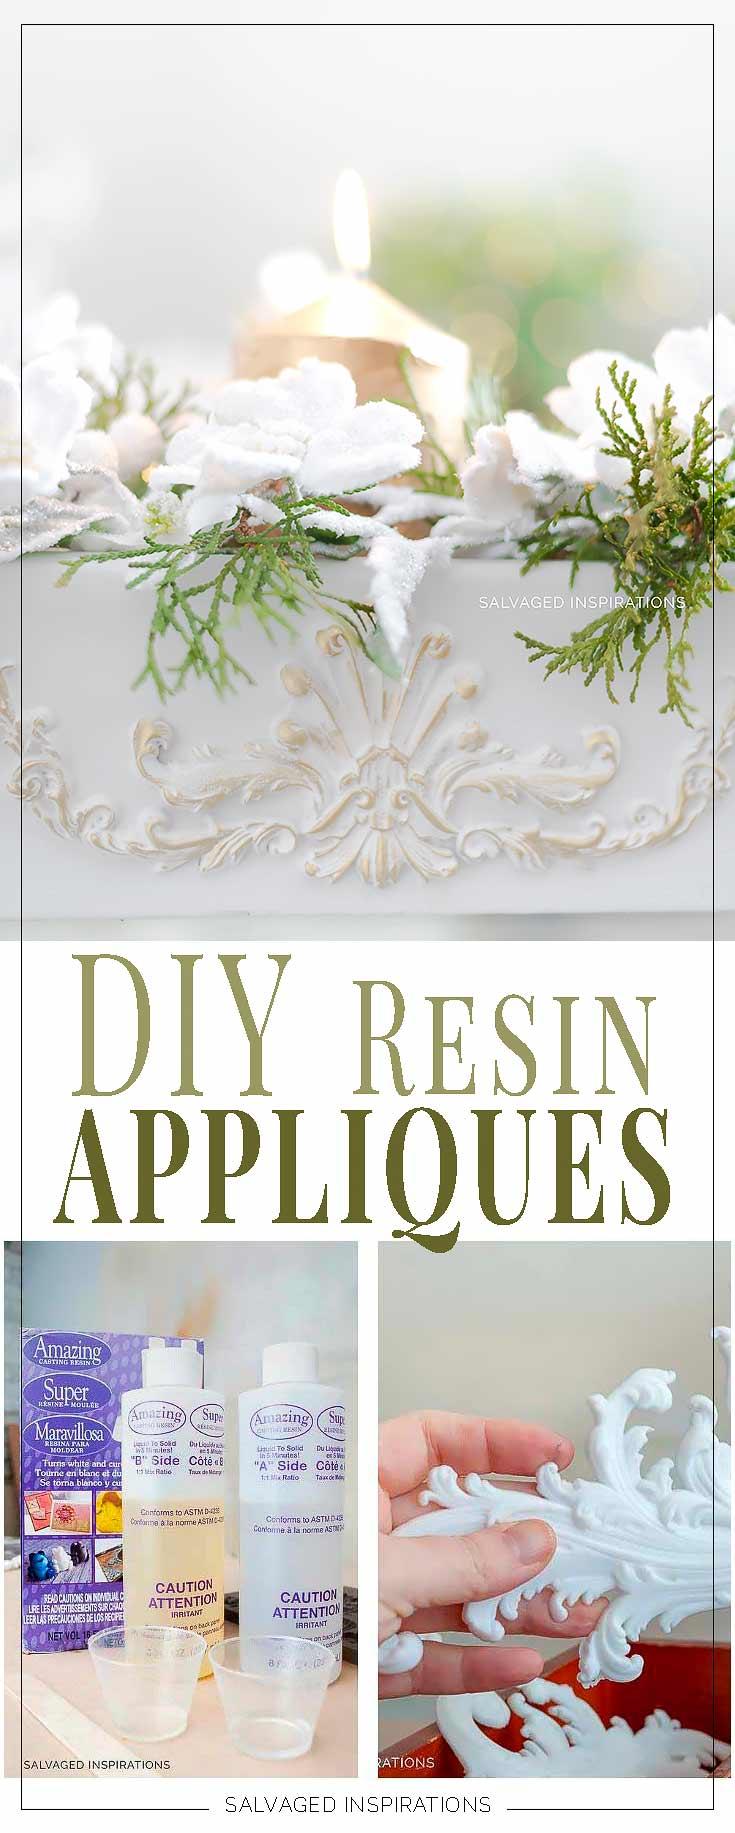 DIY Resin Appliques